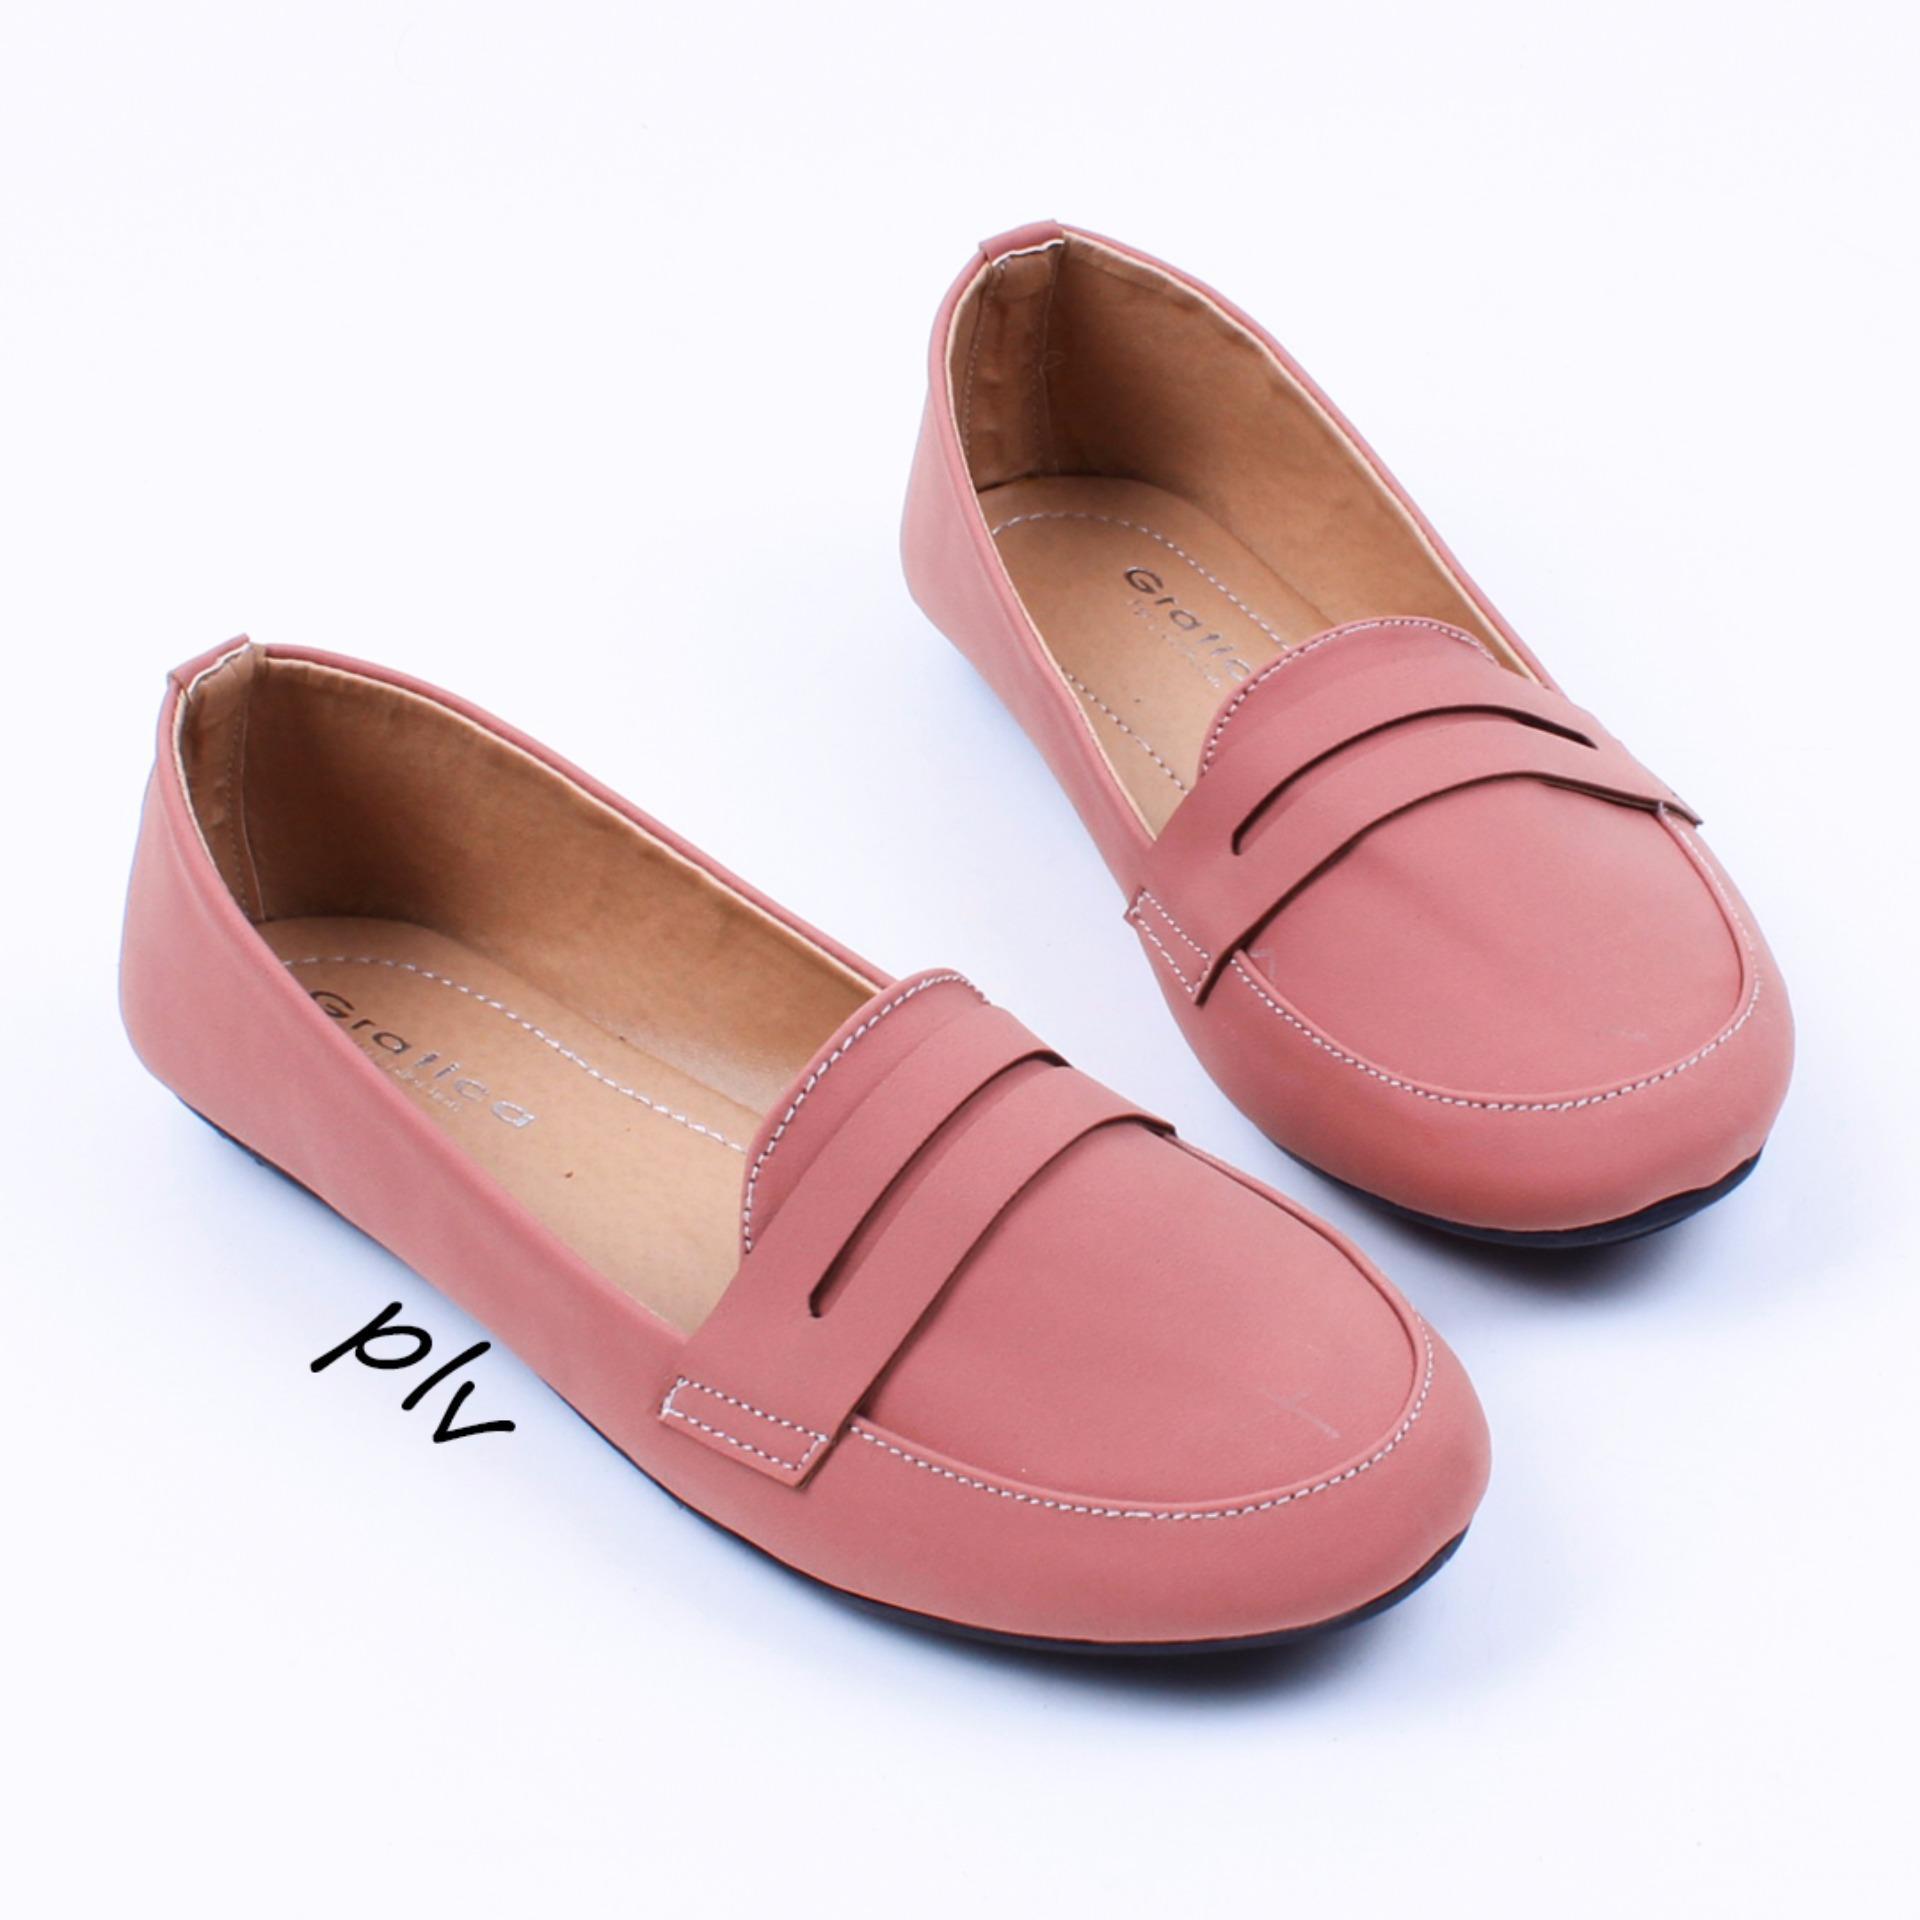 Toko Gratica Sepatu Flat Shoes Al29 Salem Lengkap Di Jawa Barat